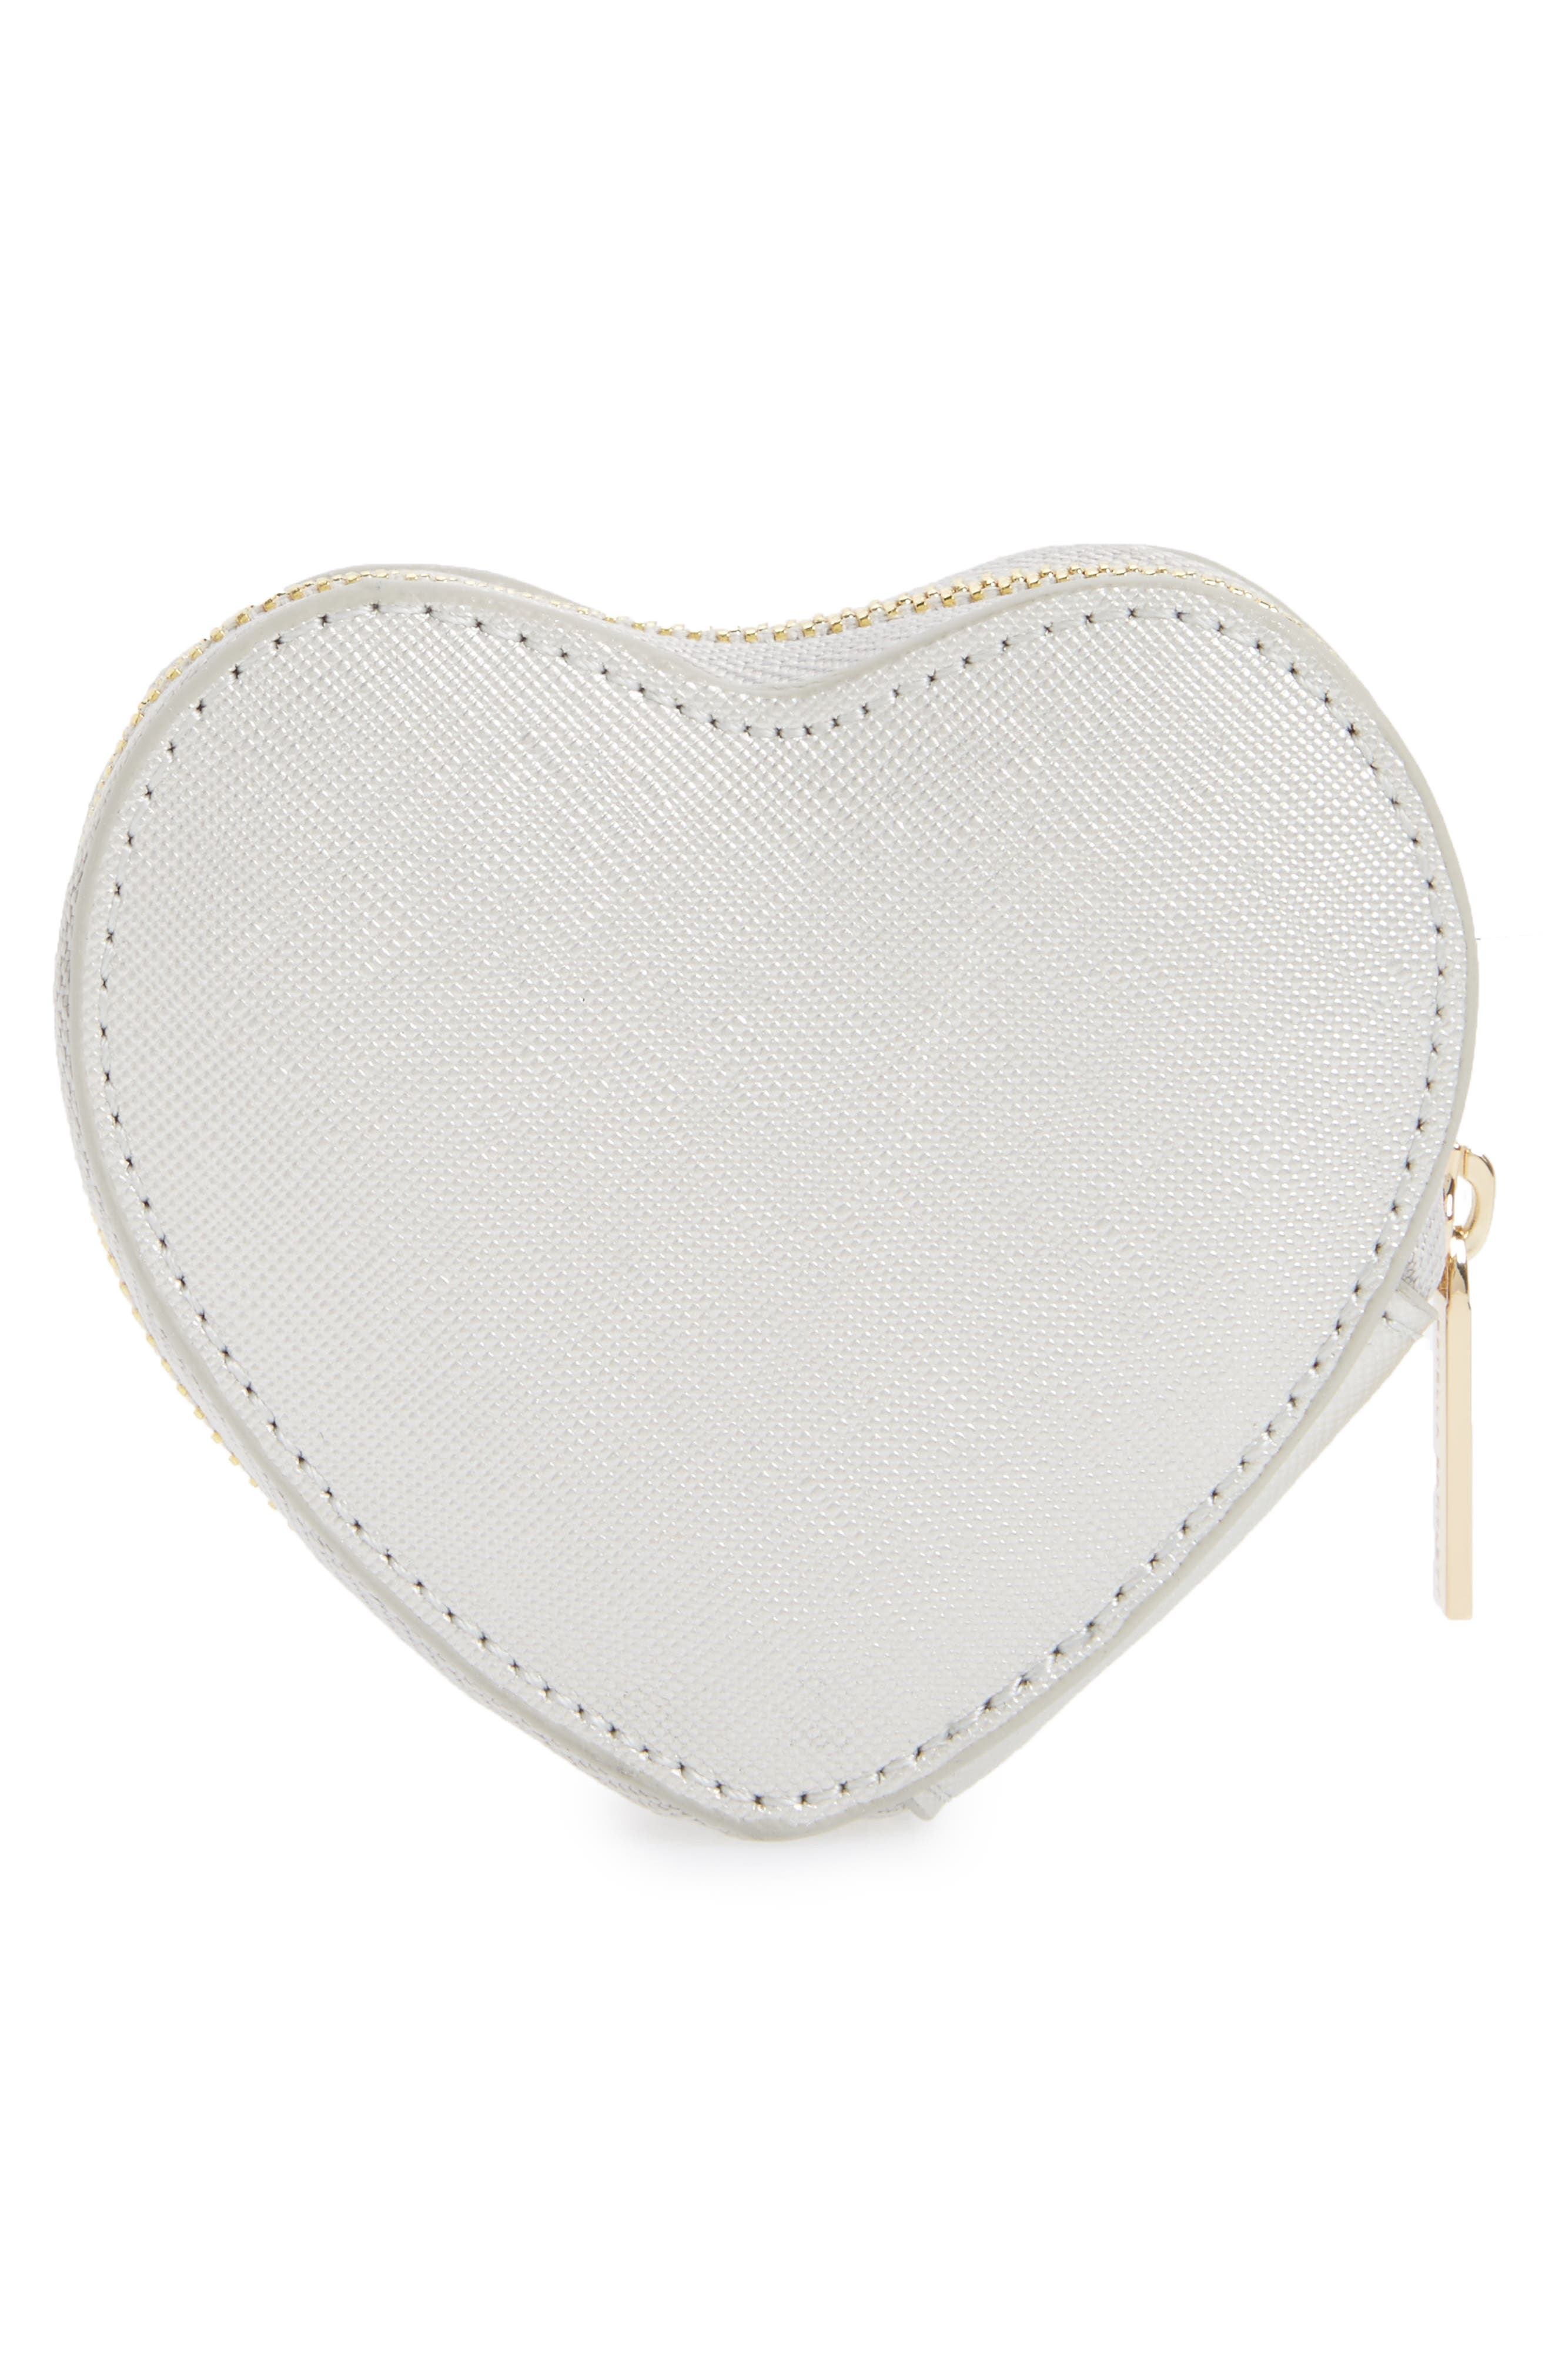 Alternate Image 3  - Estella Bartlett Heart Dream Faux Leather Coin Purse